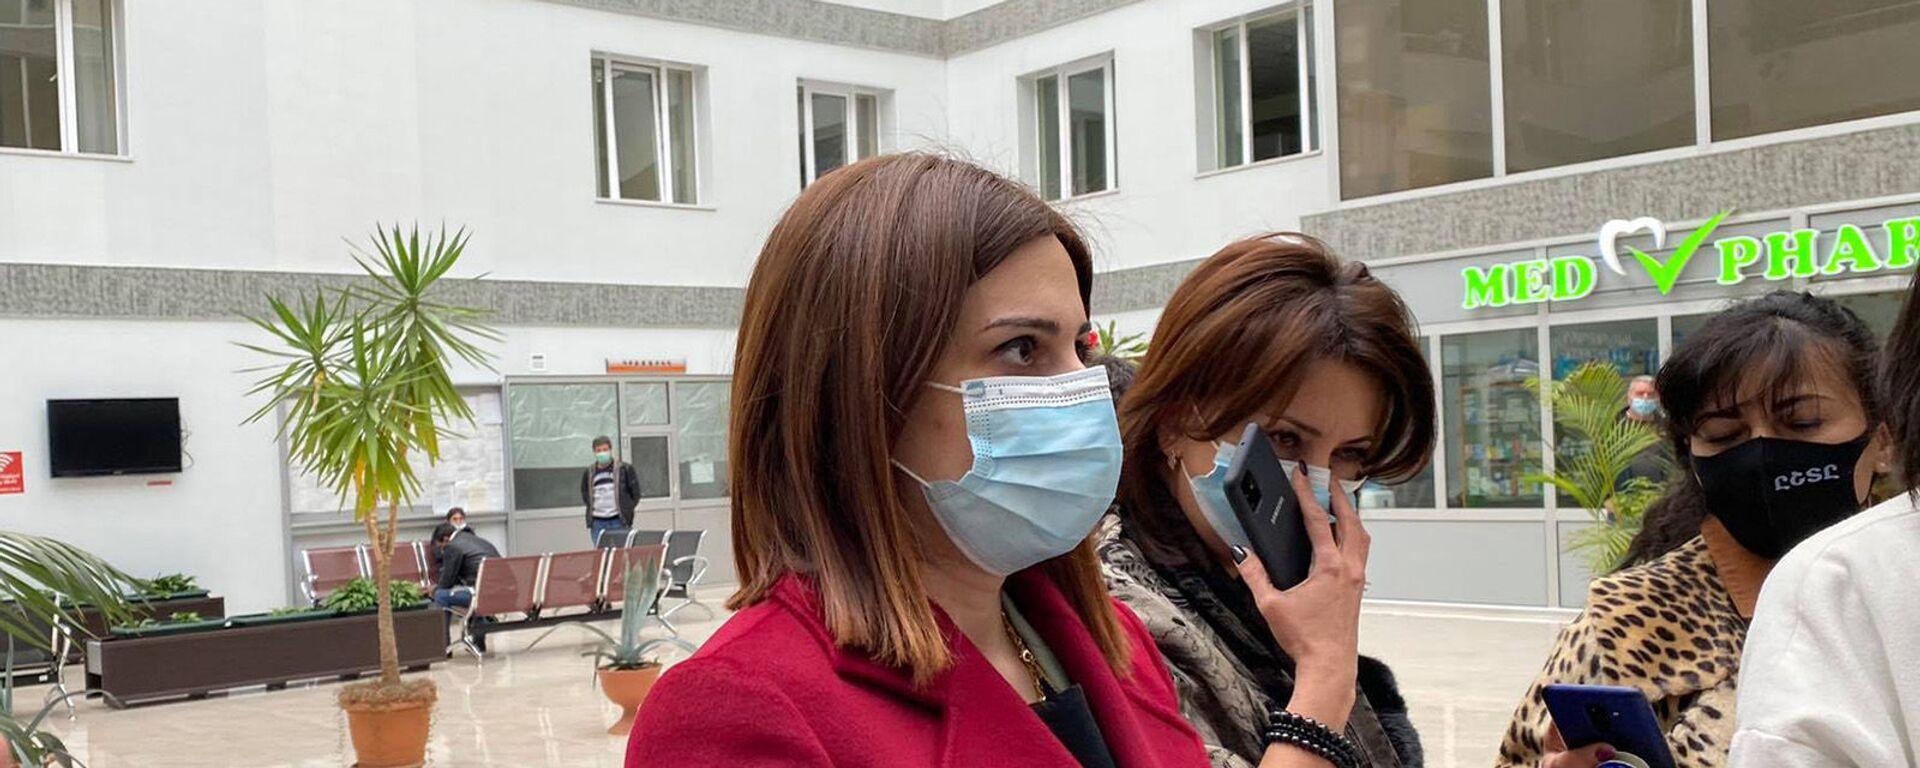 Министр здравоохранения Анаит Аванесян во время посещения Медицинского центра Гюмри (12 февраля 2021). Гюмри - Sputnik Армения, 1920, 04.03.2021